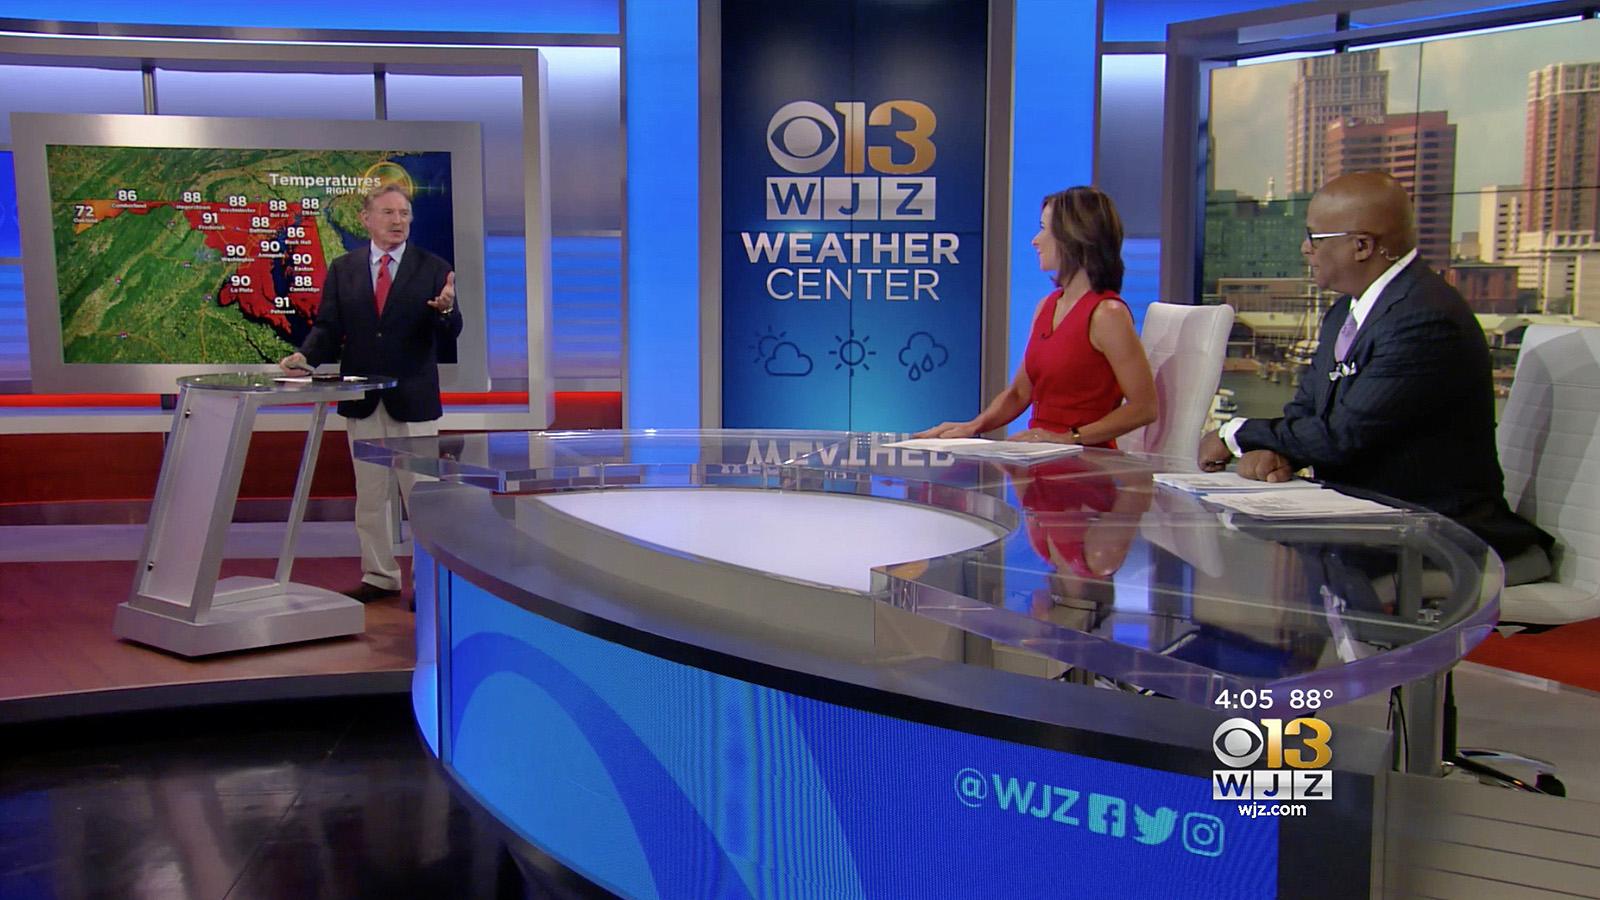 ncs_WJZ-CBS-13-Baltimore-TV-Studio_0001